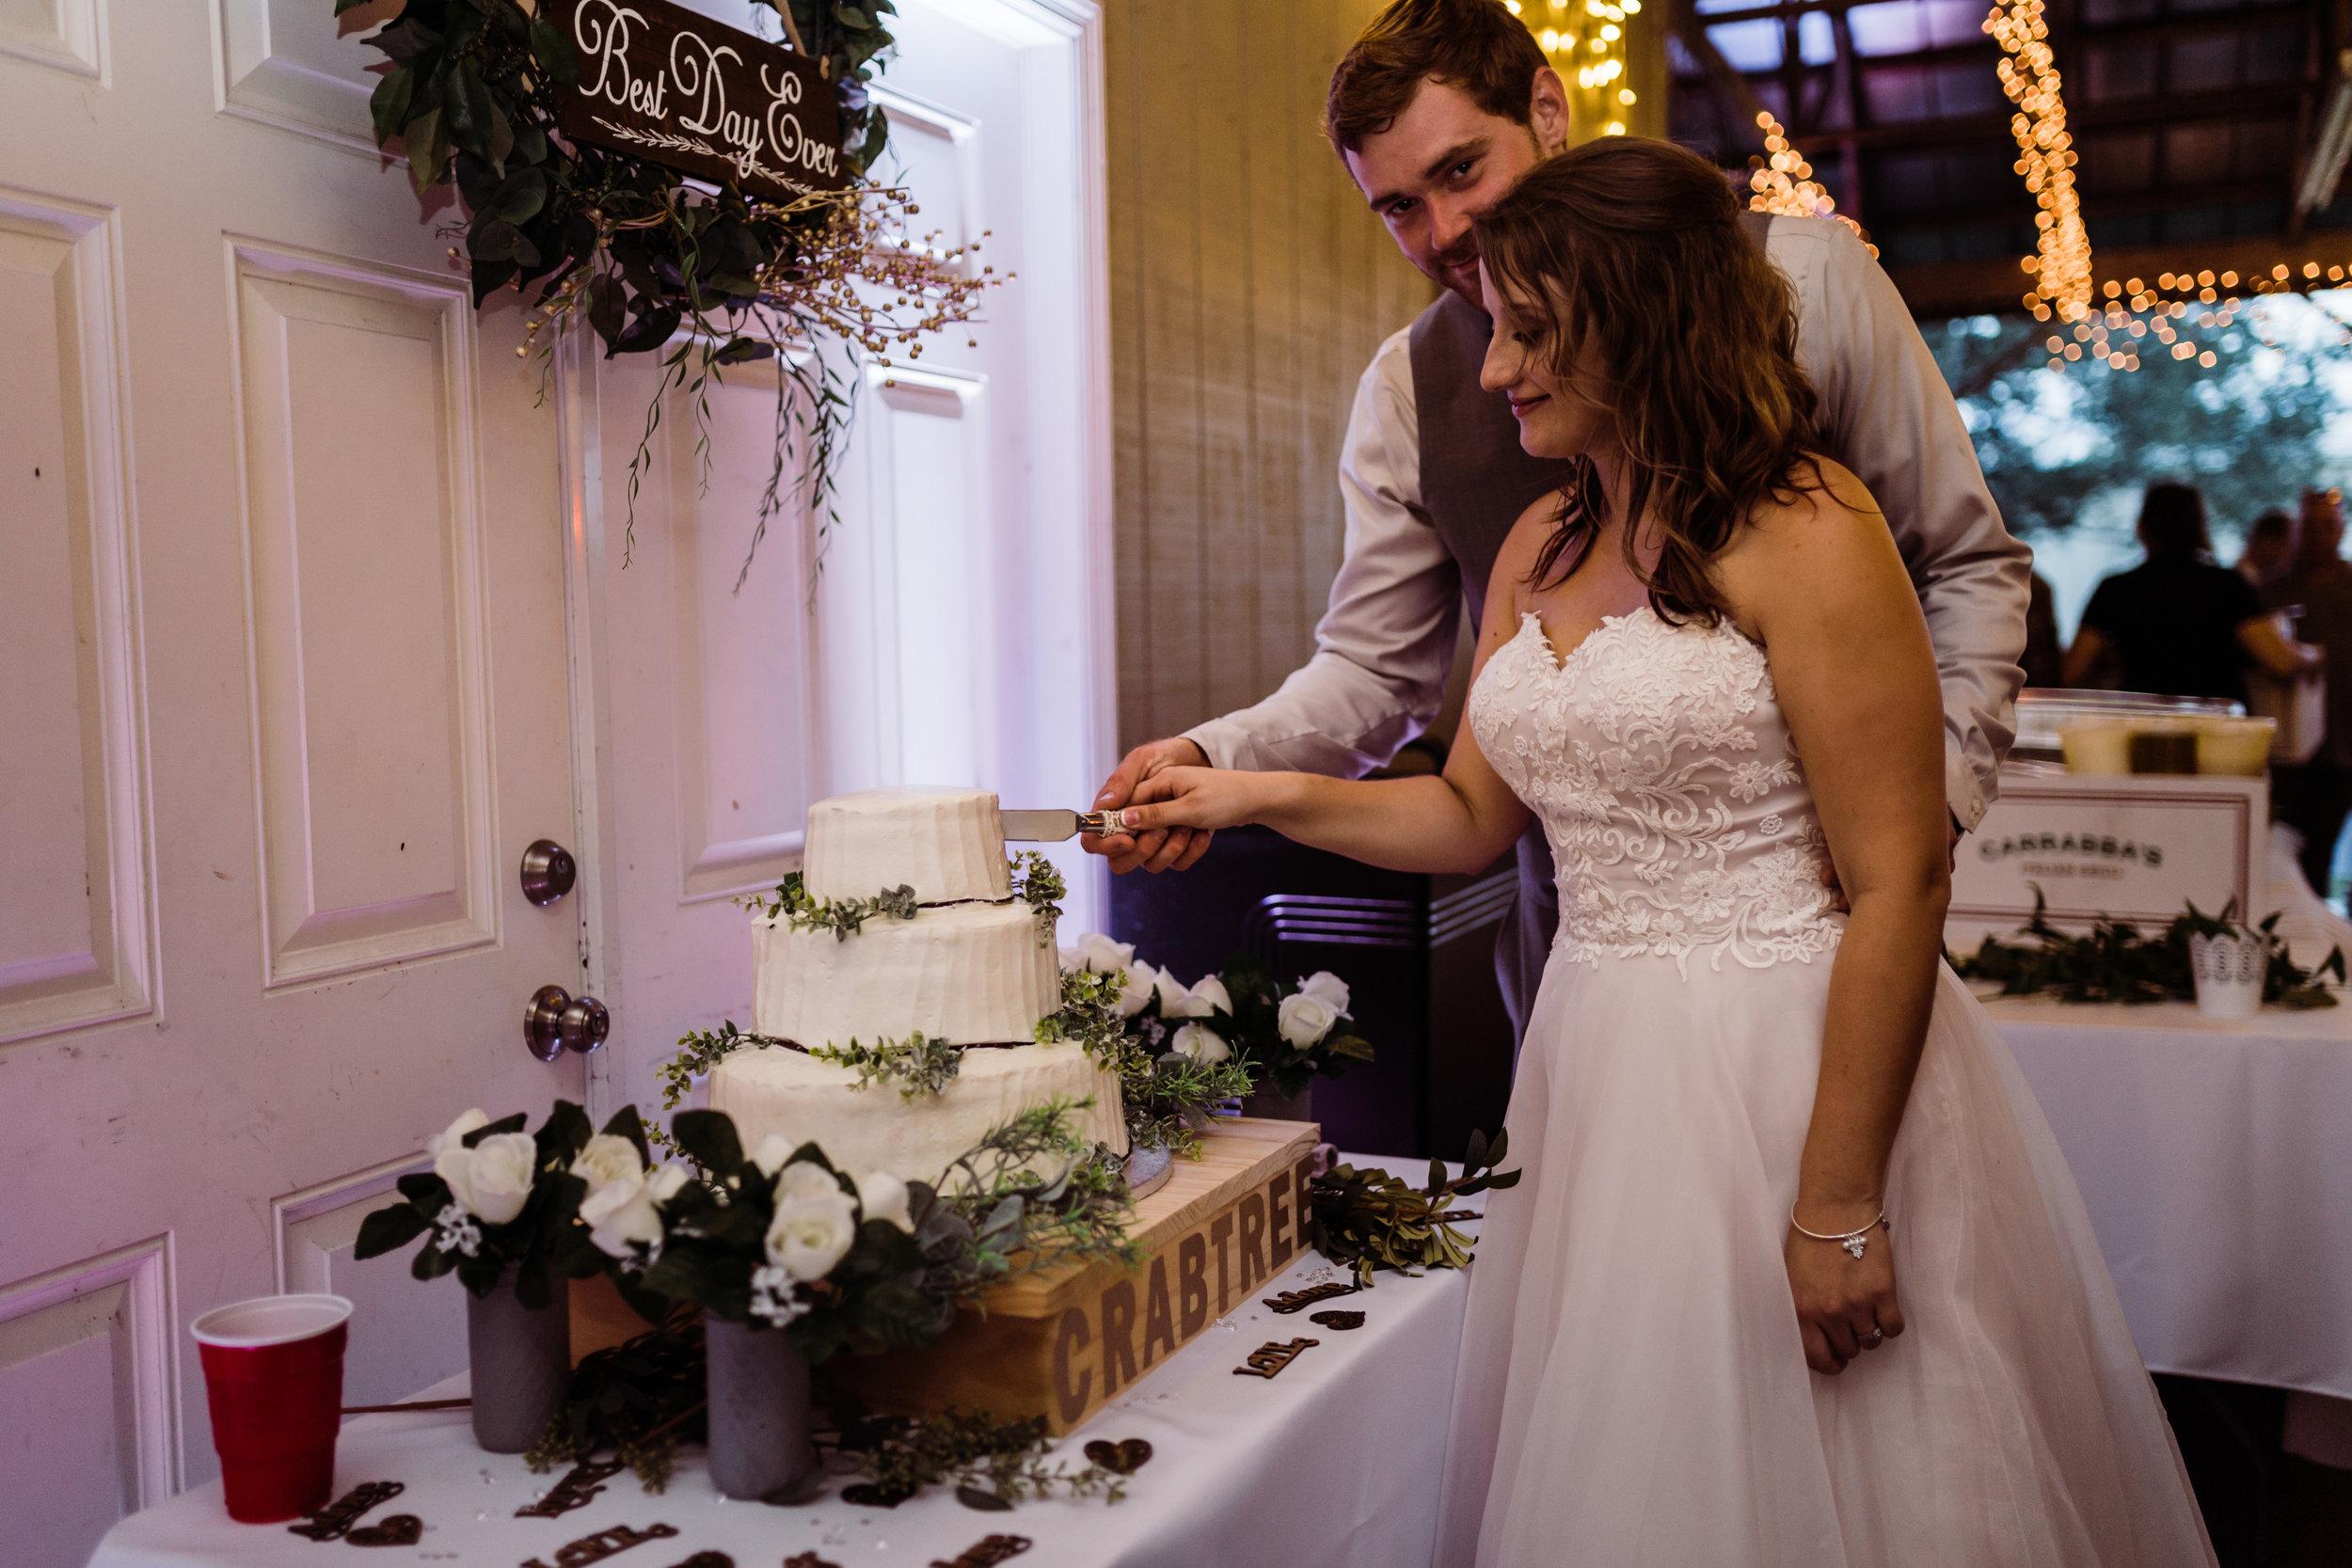 2017.10.14 Samantha and Matthew Crabtree Sarasota Wedding (541 of 708).jpg